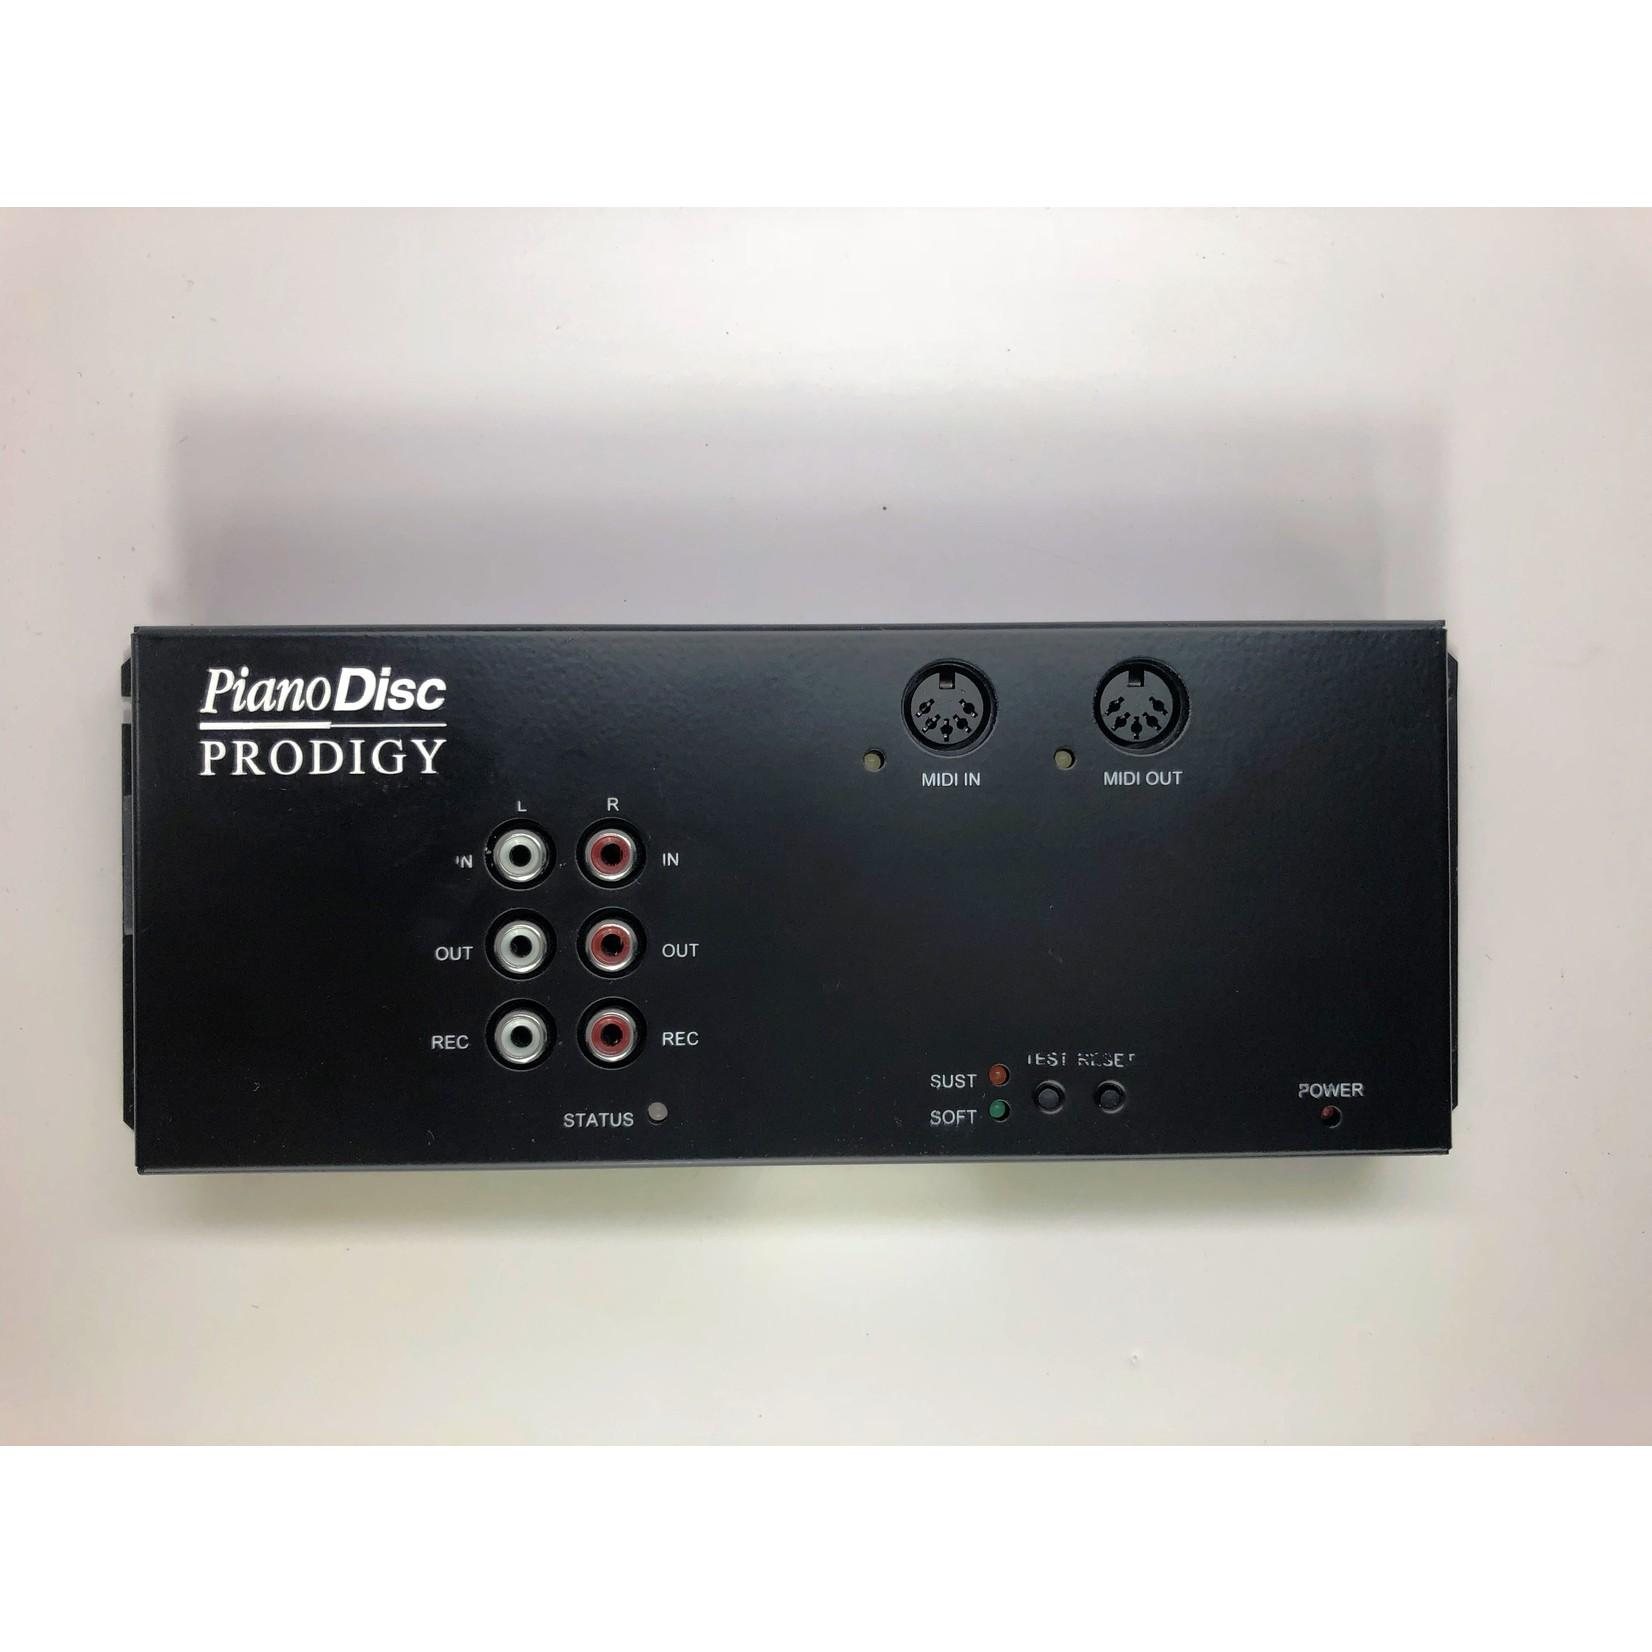 PianoDisc Prodigy HDII Driver CPU, SD4